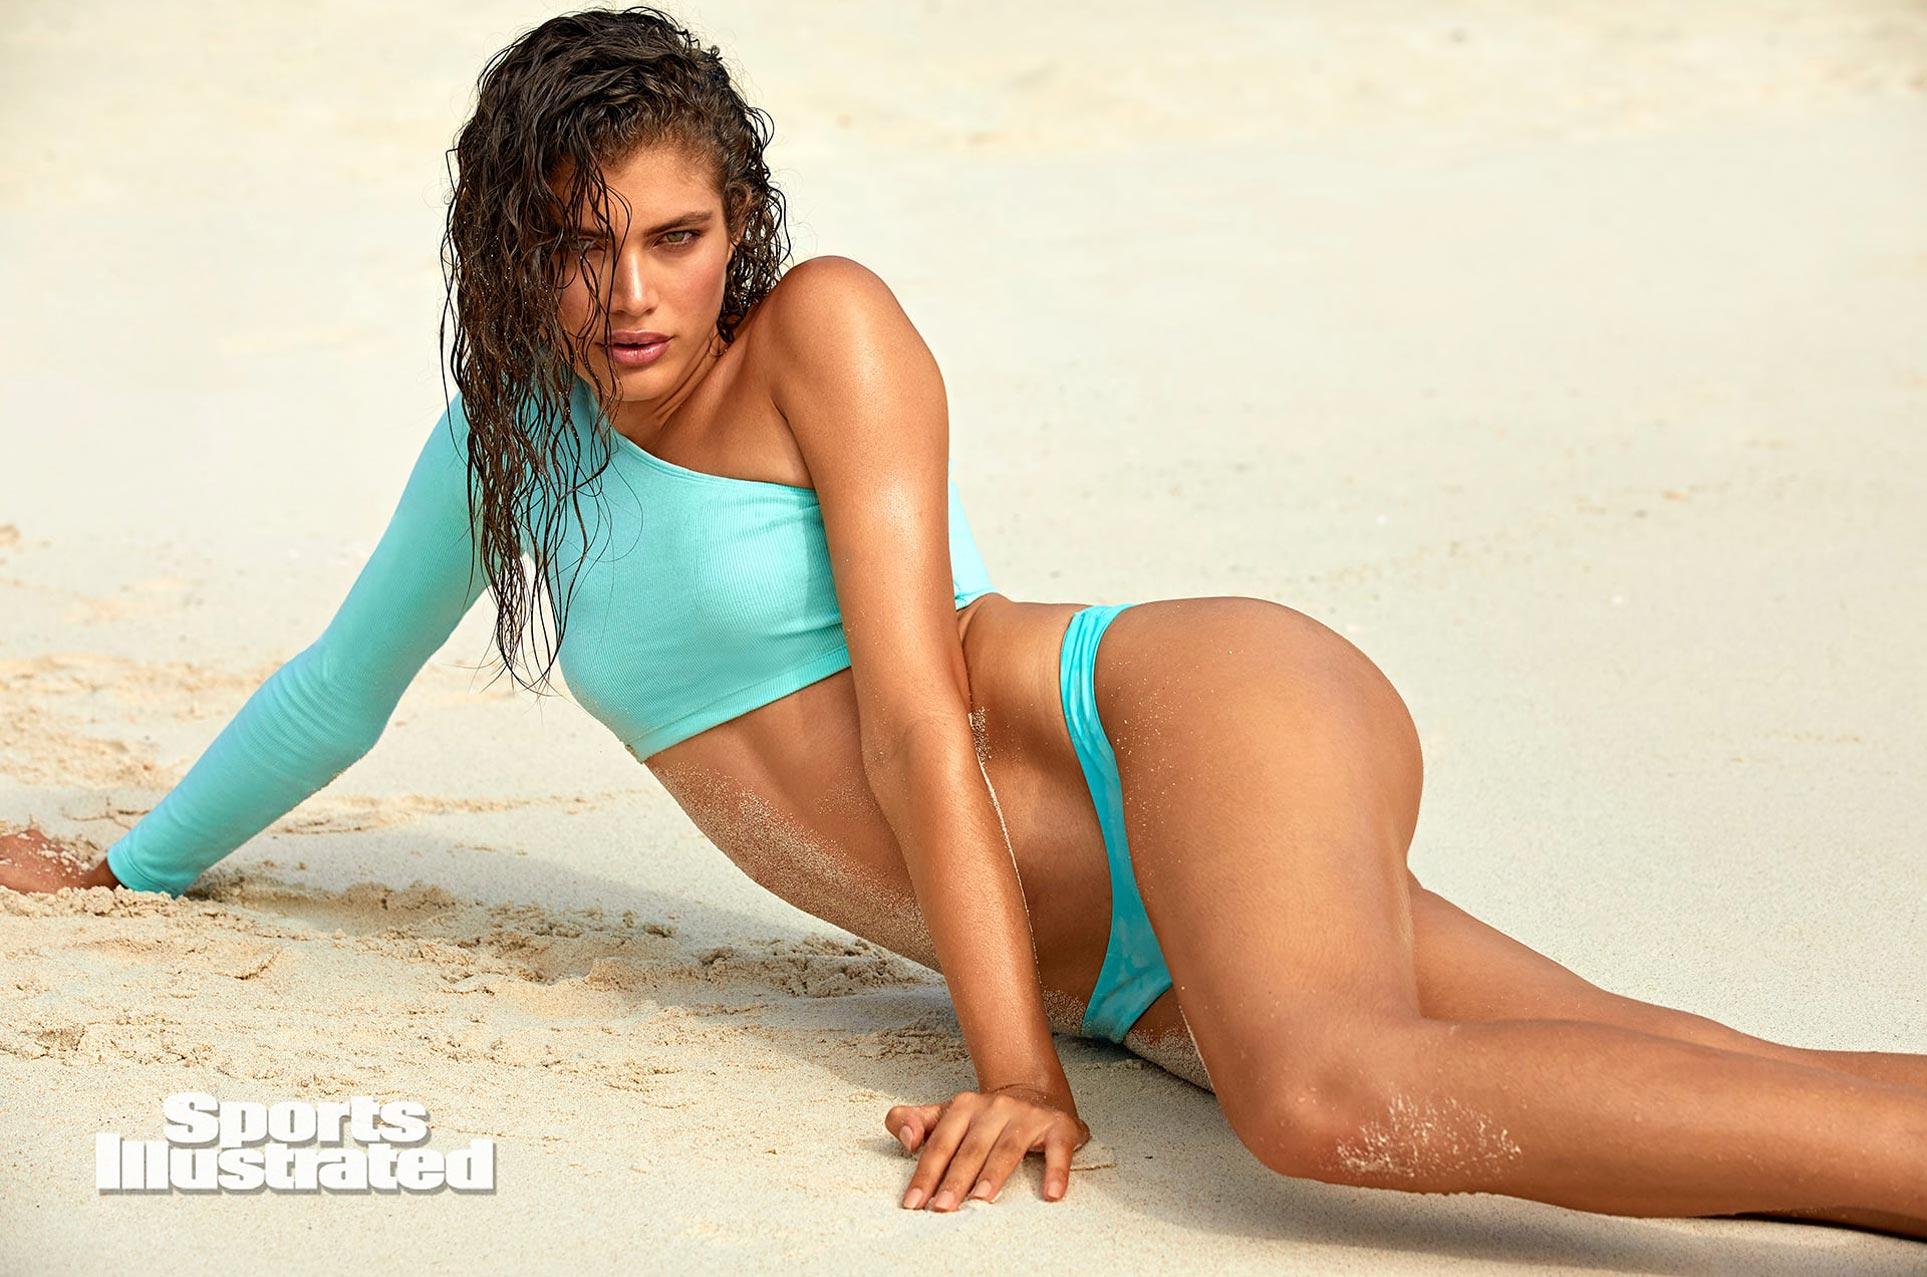 Валентина Сампайо в каталоге купальников Sports Illustrated Swimsuit 2020 / фото 07